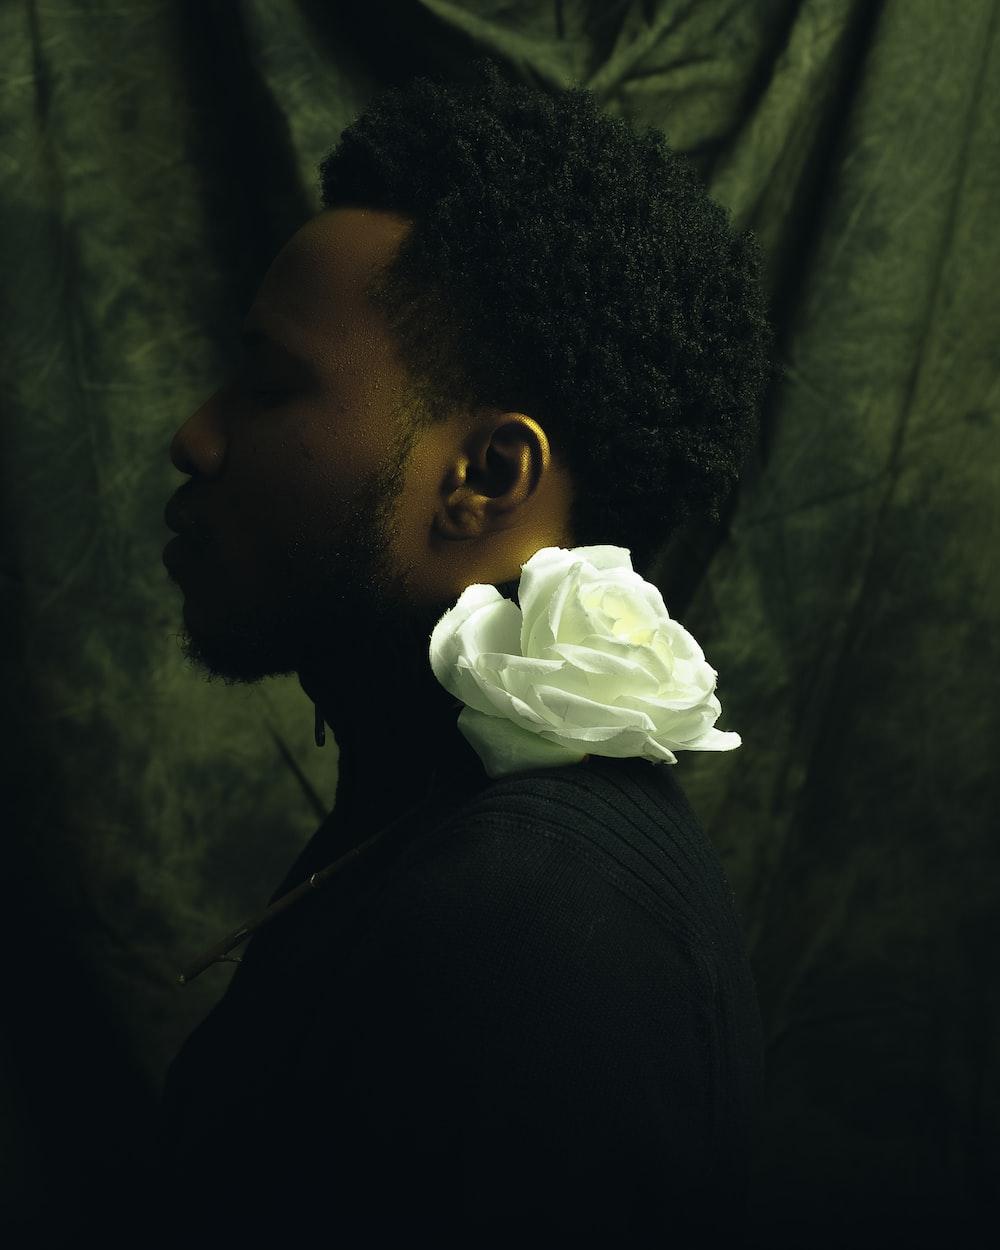 man in black shirt holding white rose